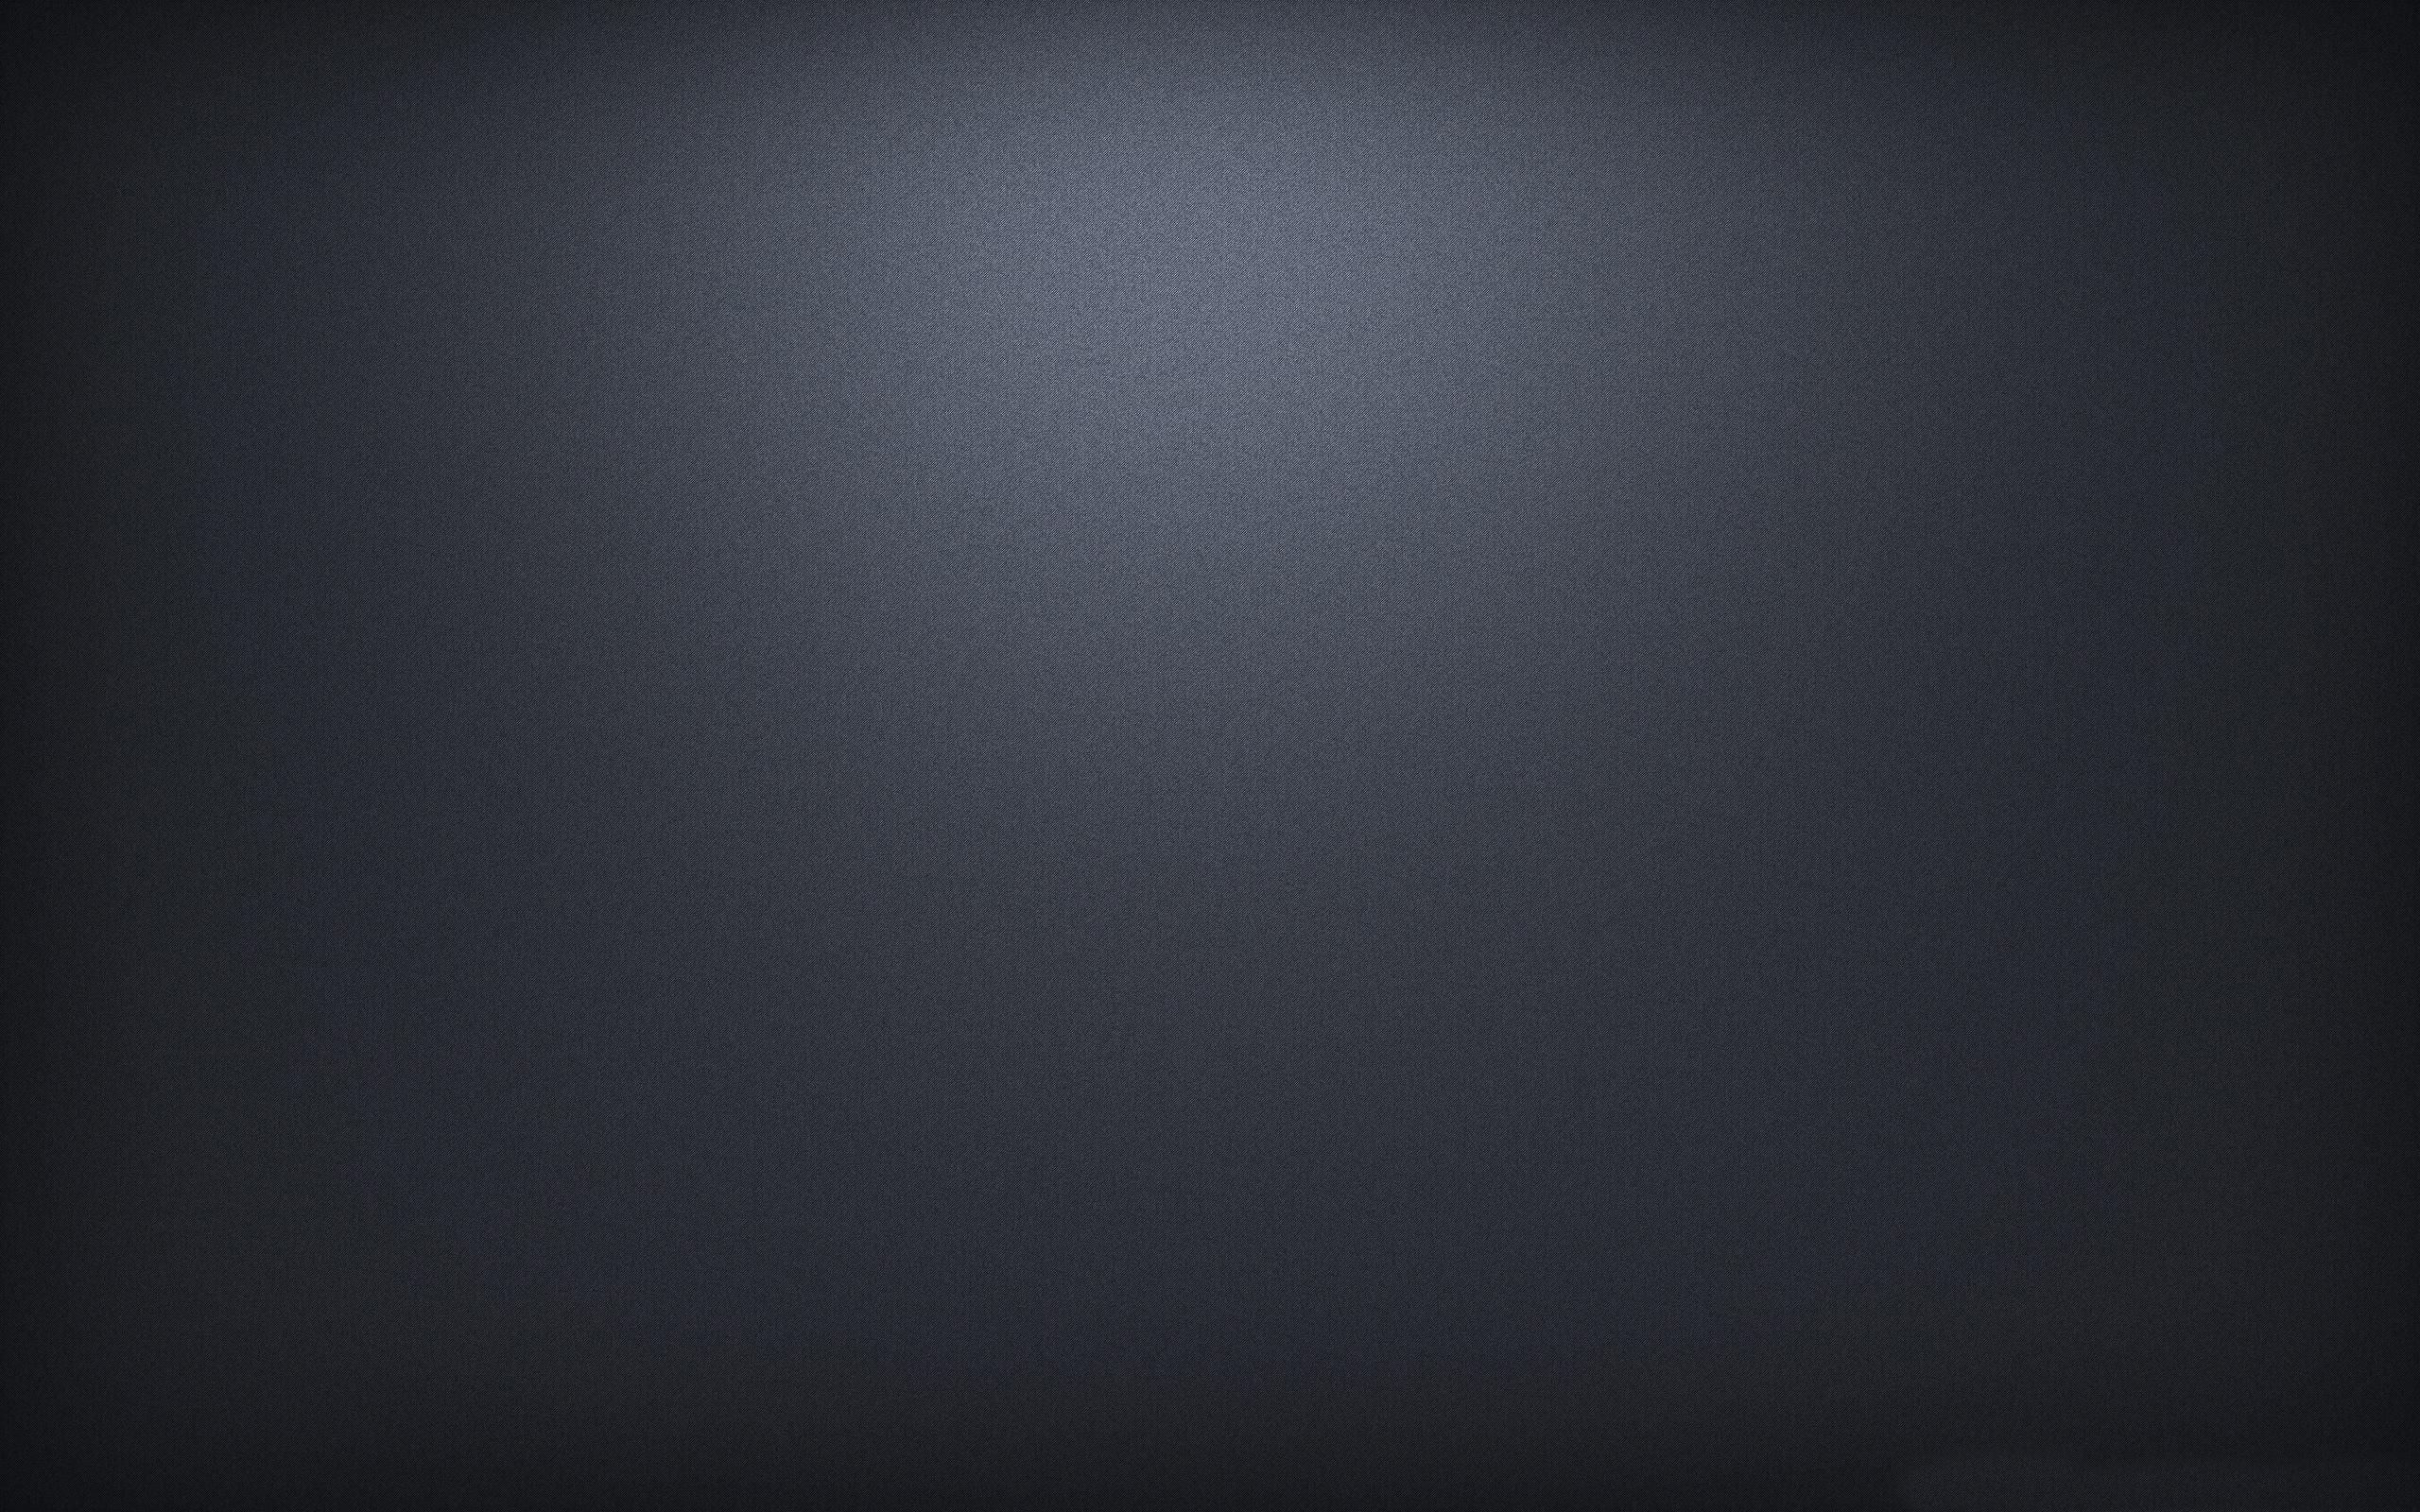 Dark Fabric Background Mac Wallpaper Download